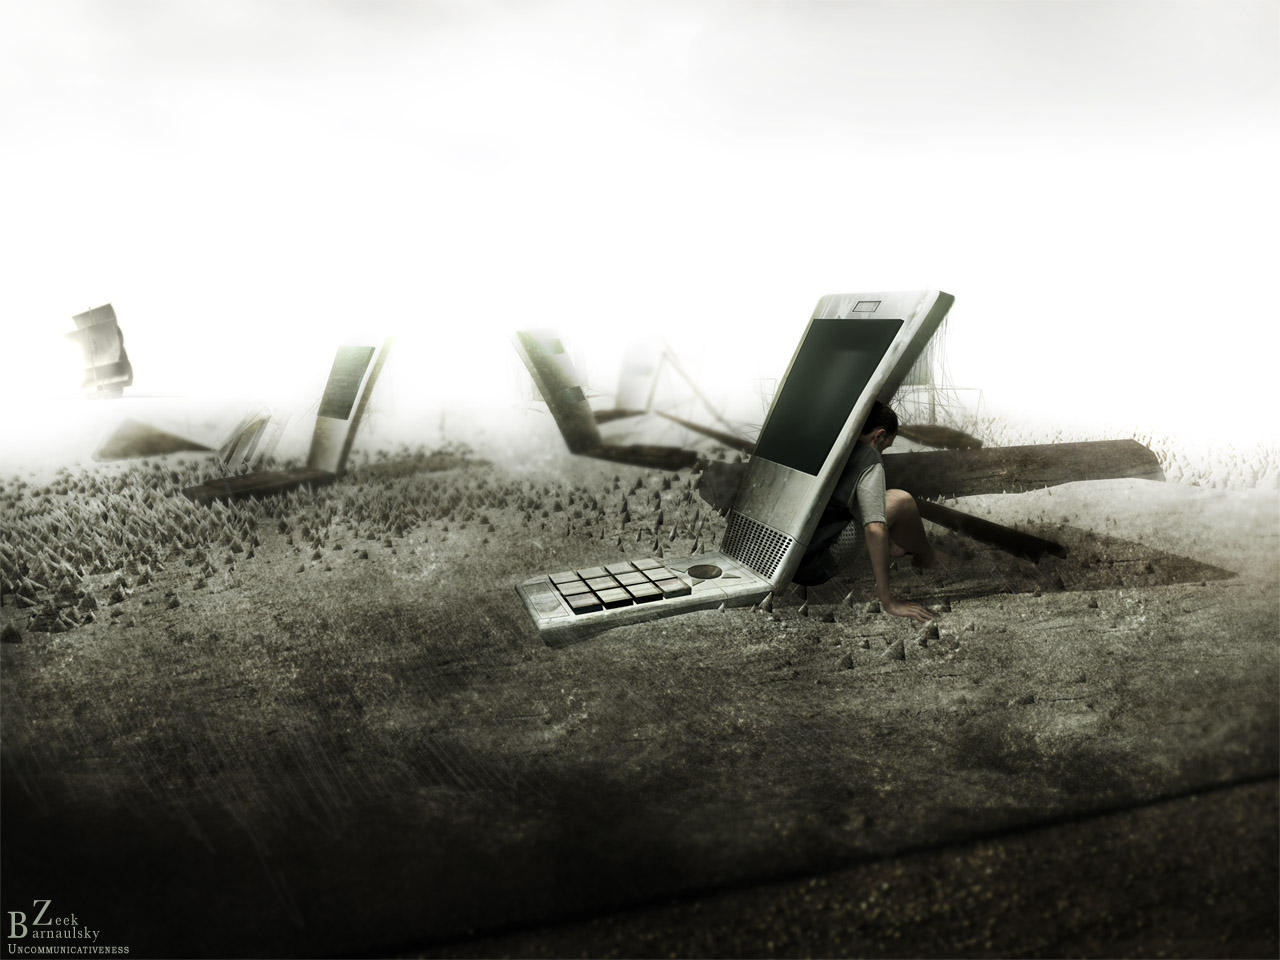 Uncommunicativeness by barnaulsky-zeek